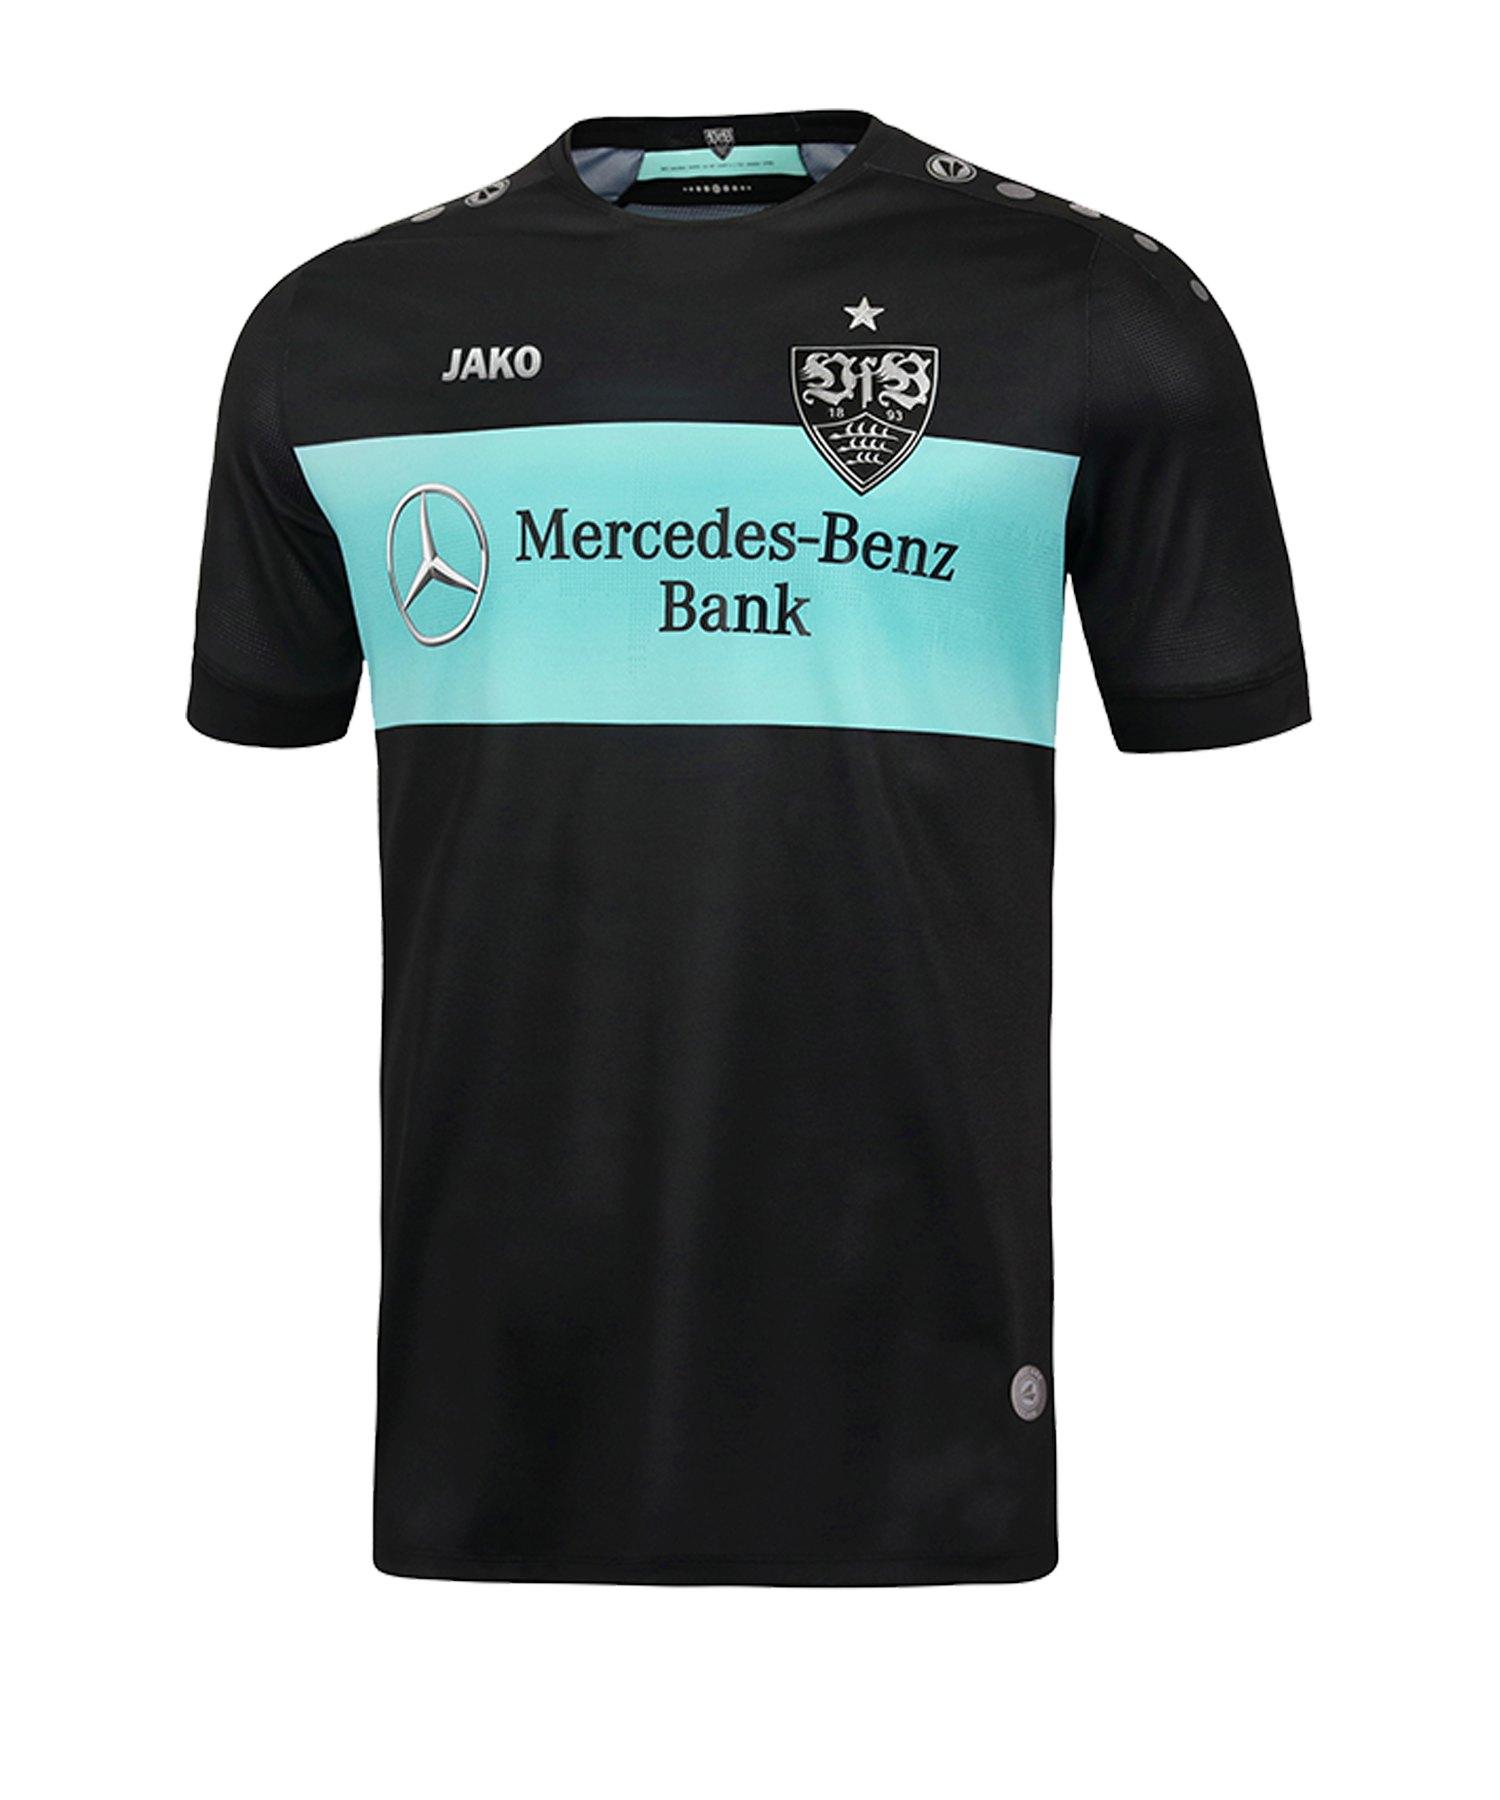 Jako VfB Stuttgart TW-Trikot Away 2019/2020 Mint Schwarz F24 - gruen